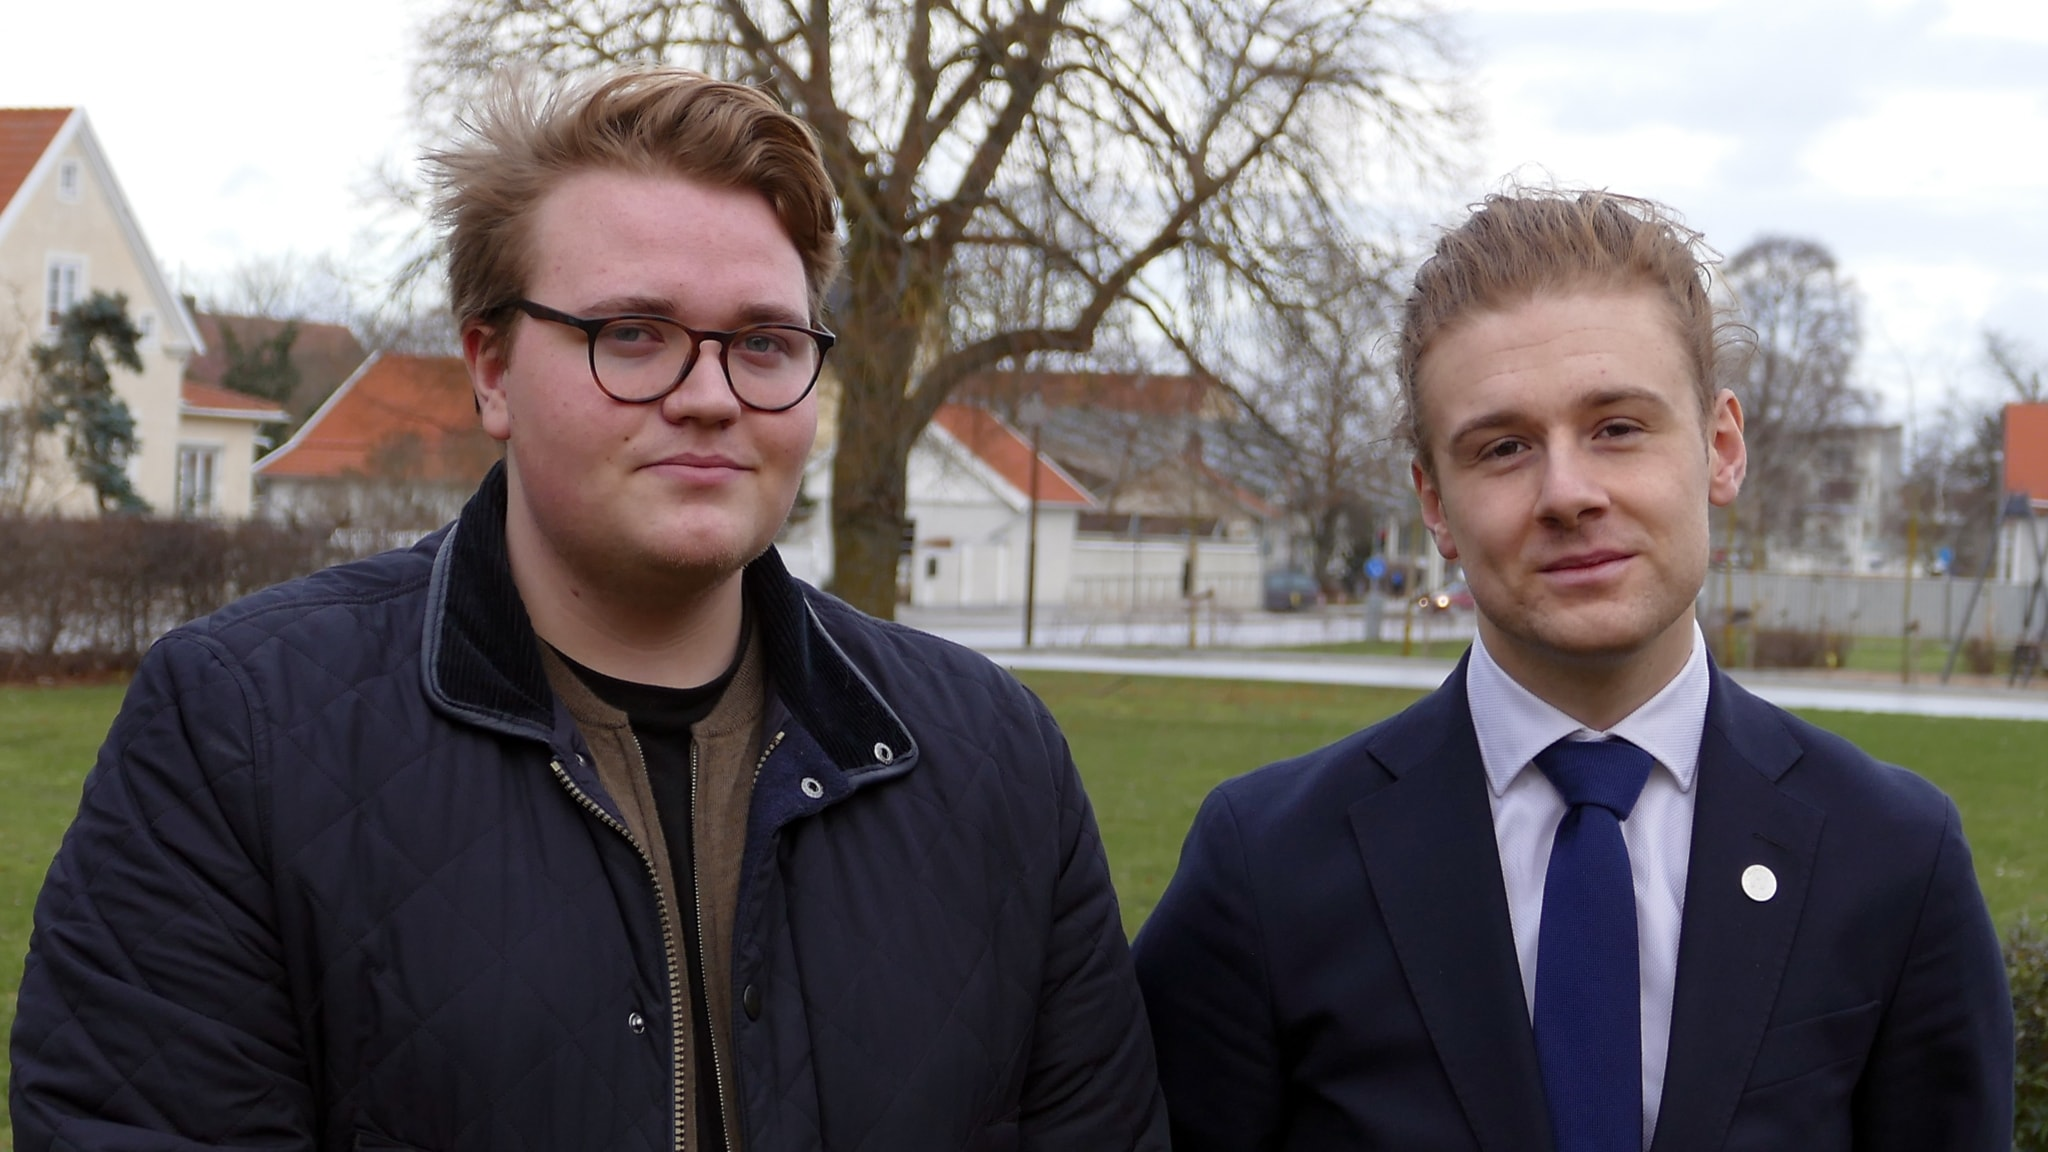 Förmiddag i P4 Gotland med Lasse Eskelind